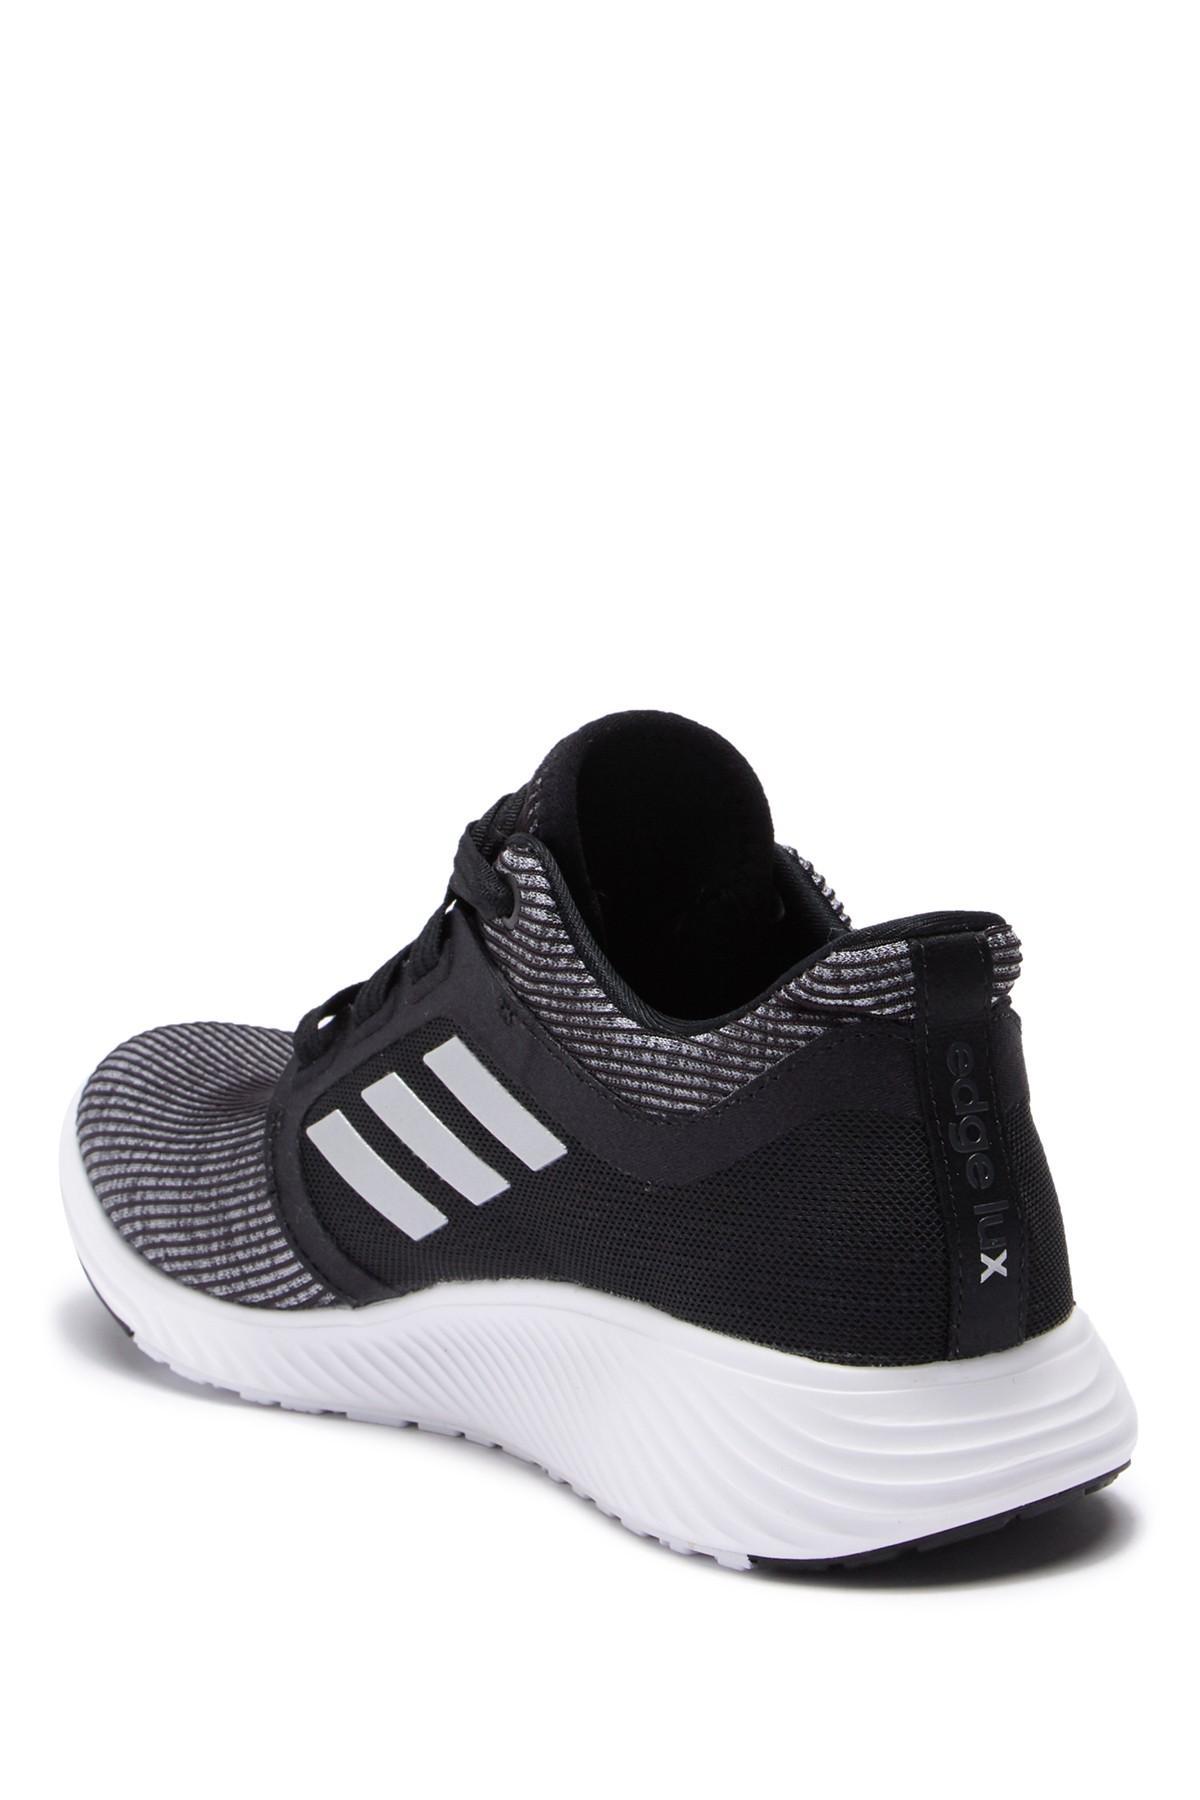 f52553dd52c Adidas - Black Edge Lux Sneaker - Lyst. View fullscreen